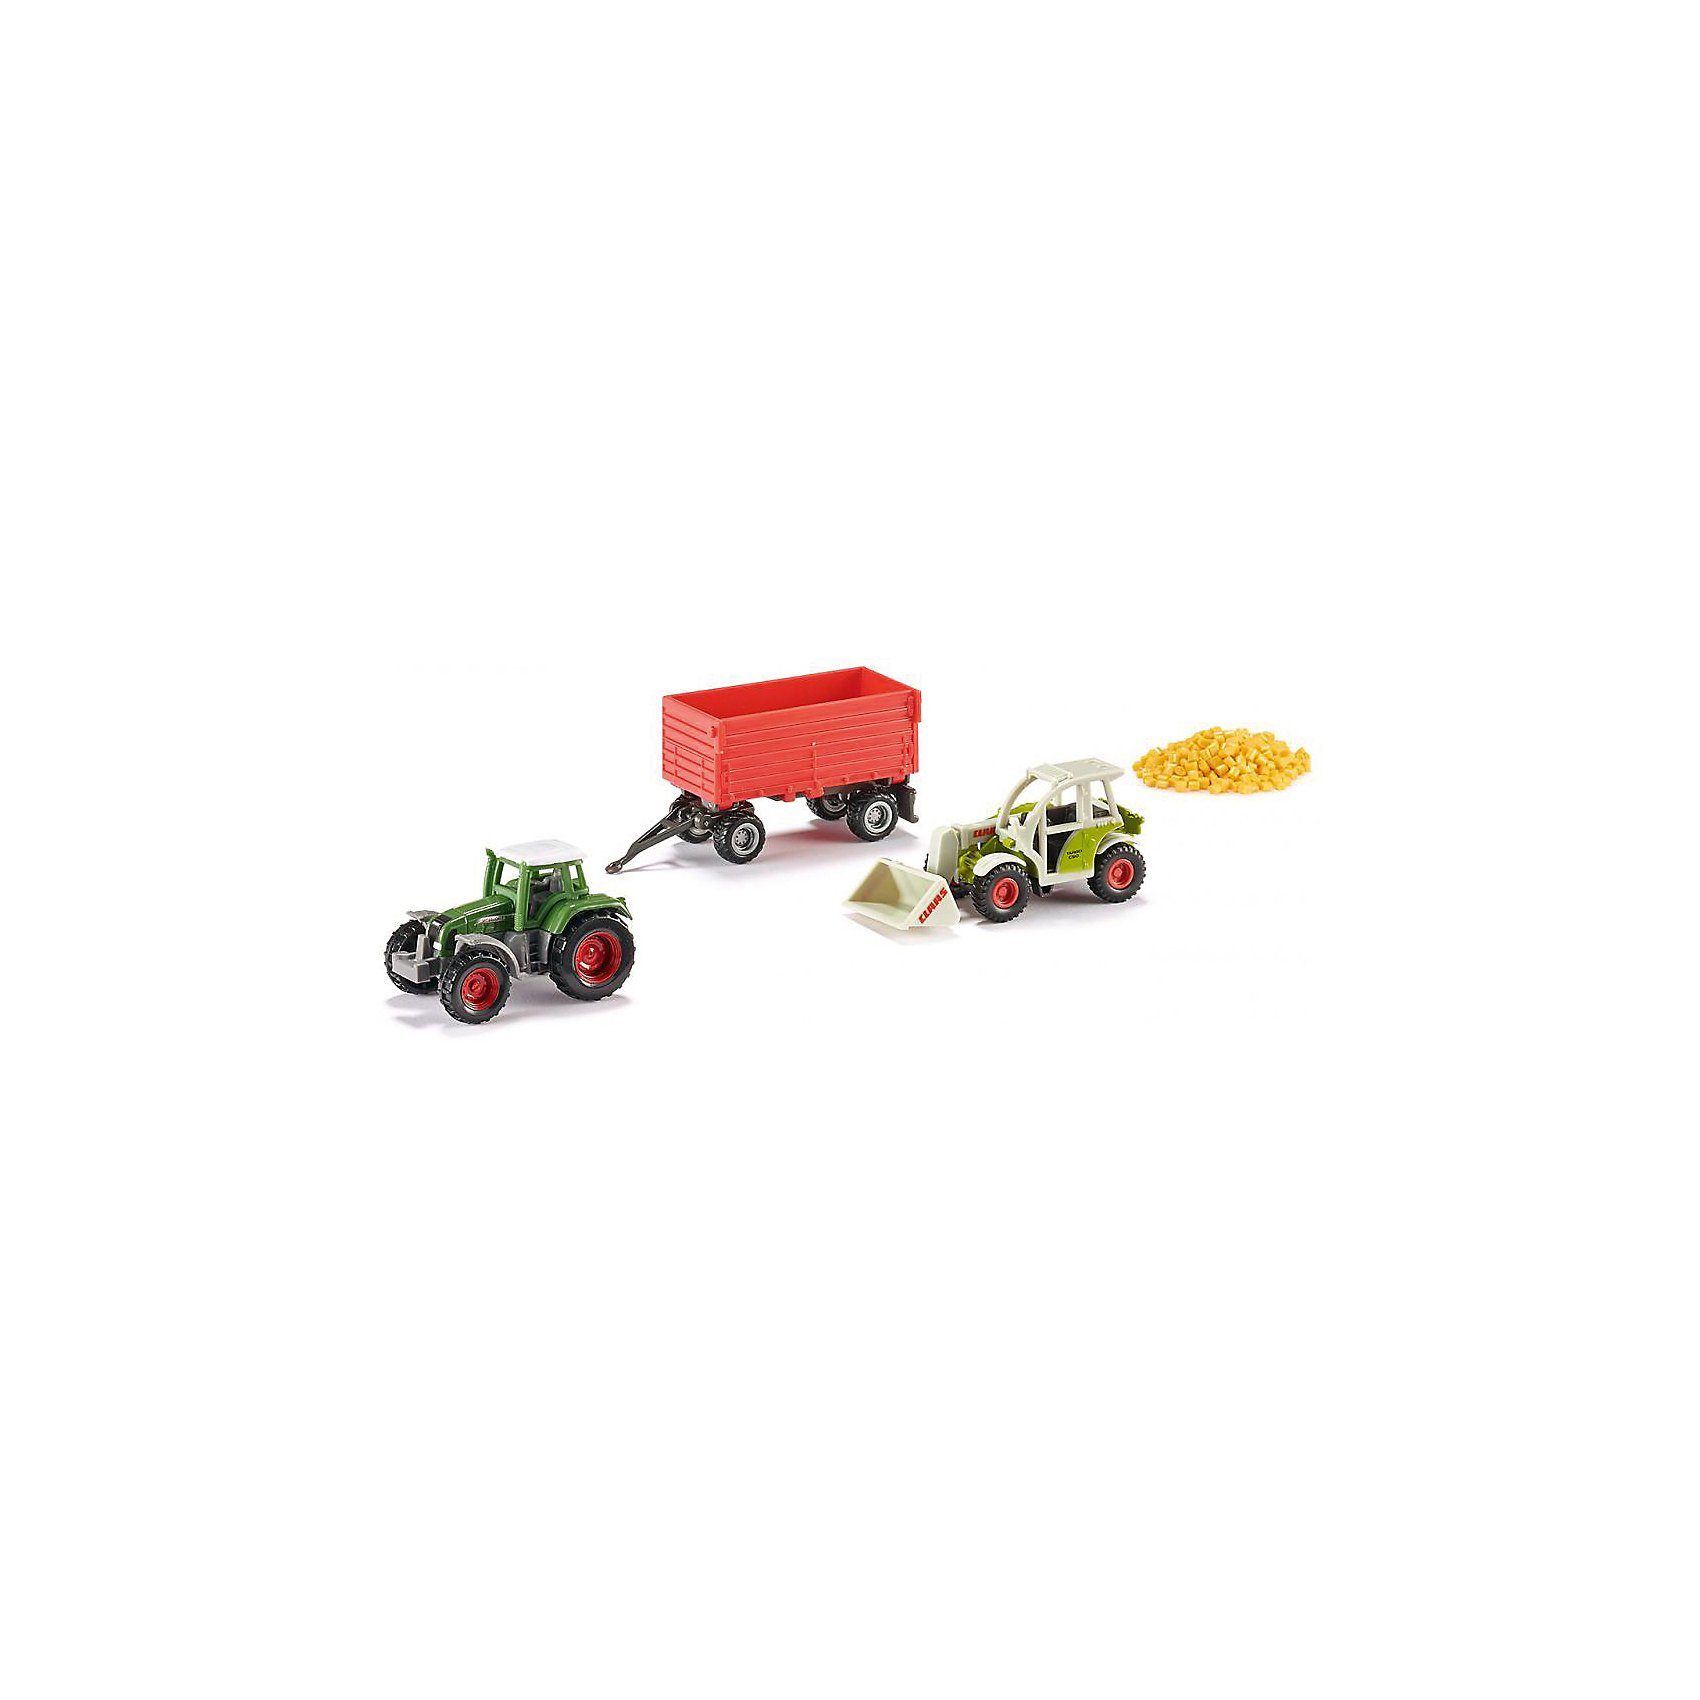 SIKU Super 6304 Geschenkset Landwirtschaft